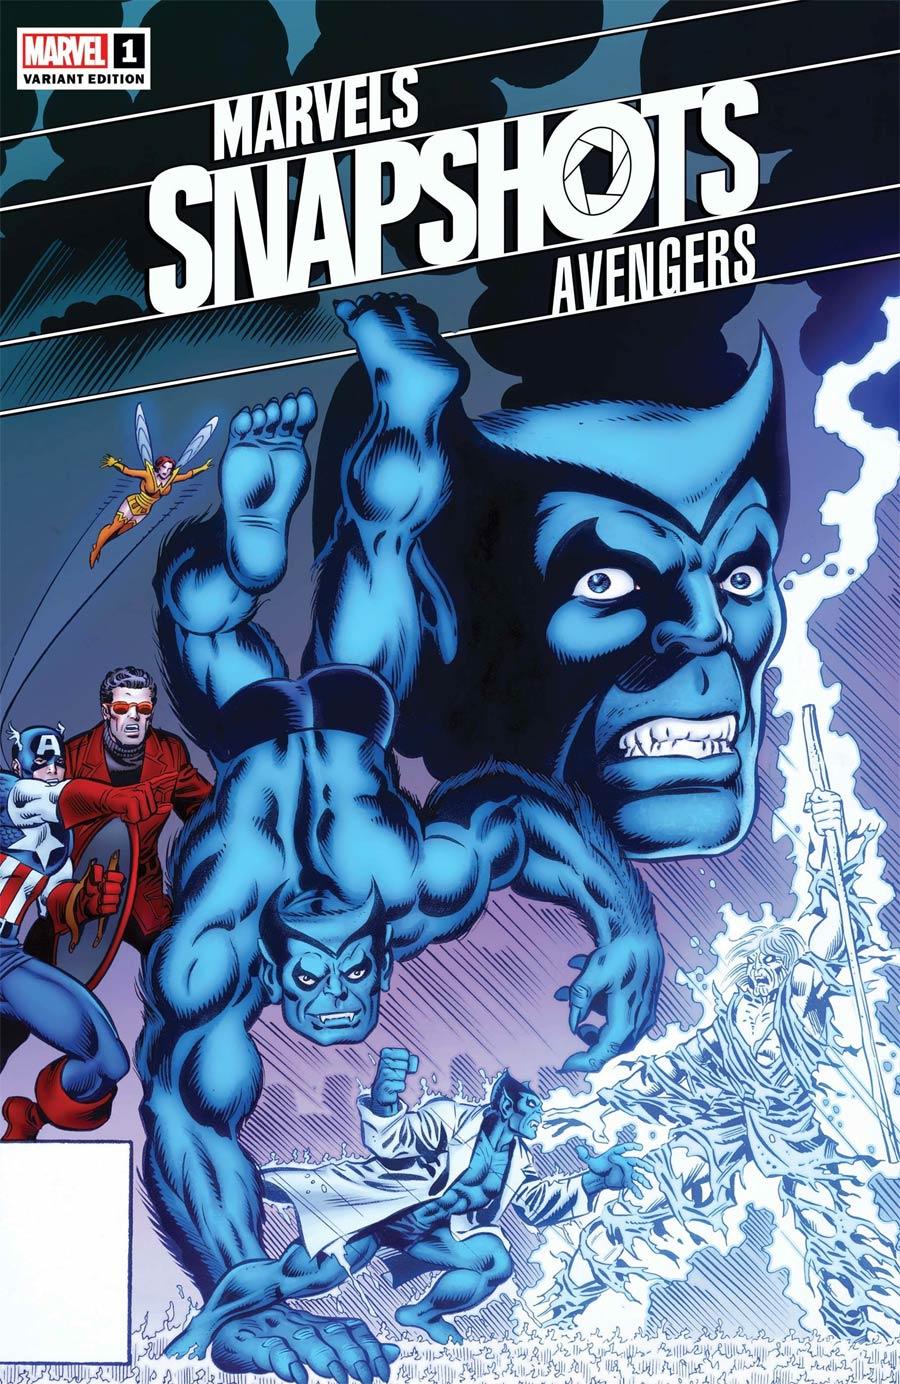 Avengers Marvels Snapshots #1 Cover C Incentive George Perez Hidden Gem Variant Cover